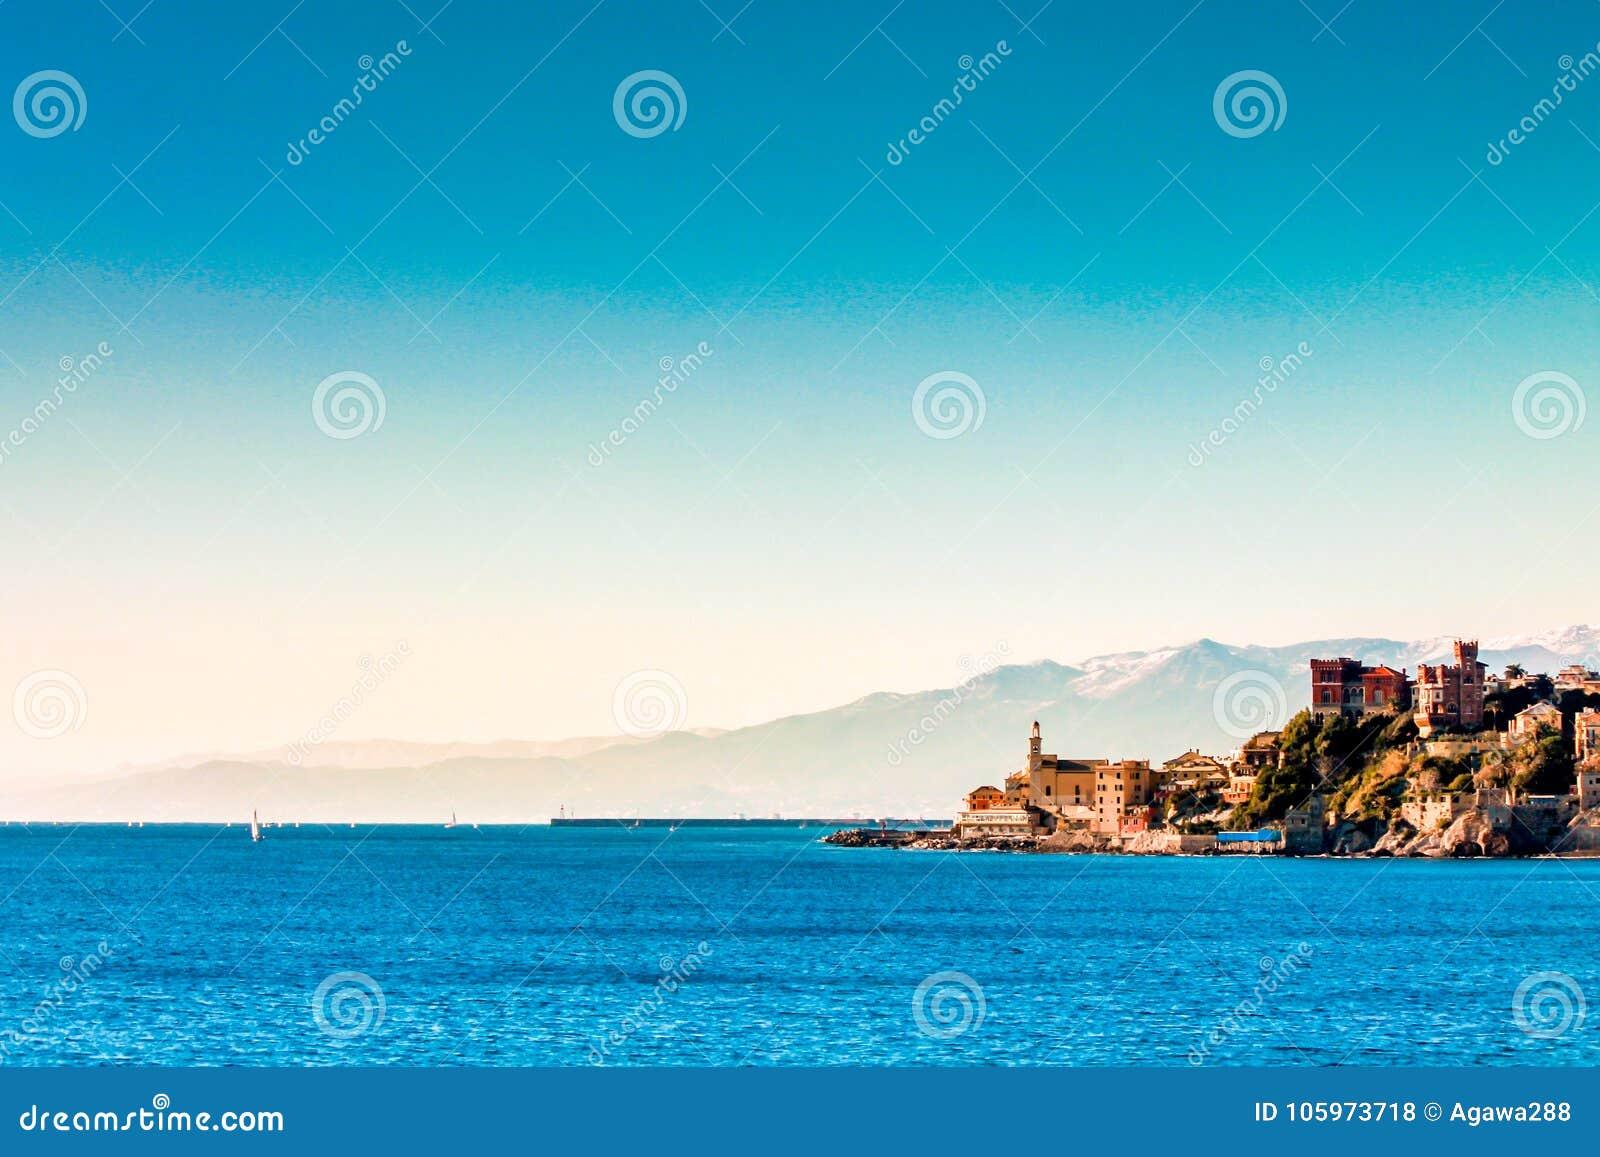 Italy, Genoa`a landmark Boccadasse winter time.